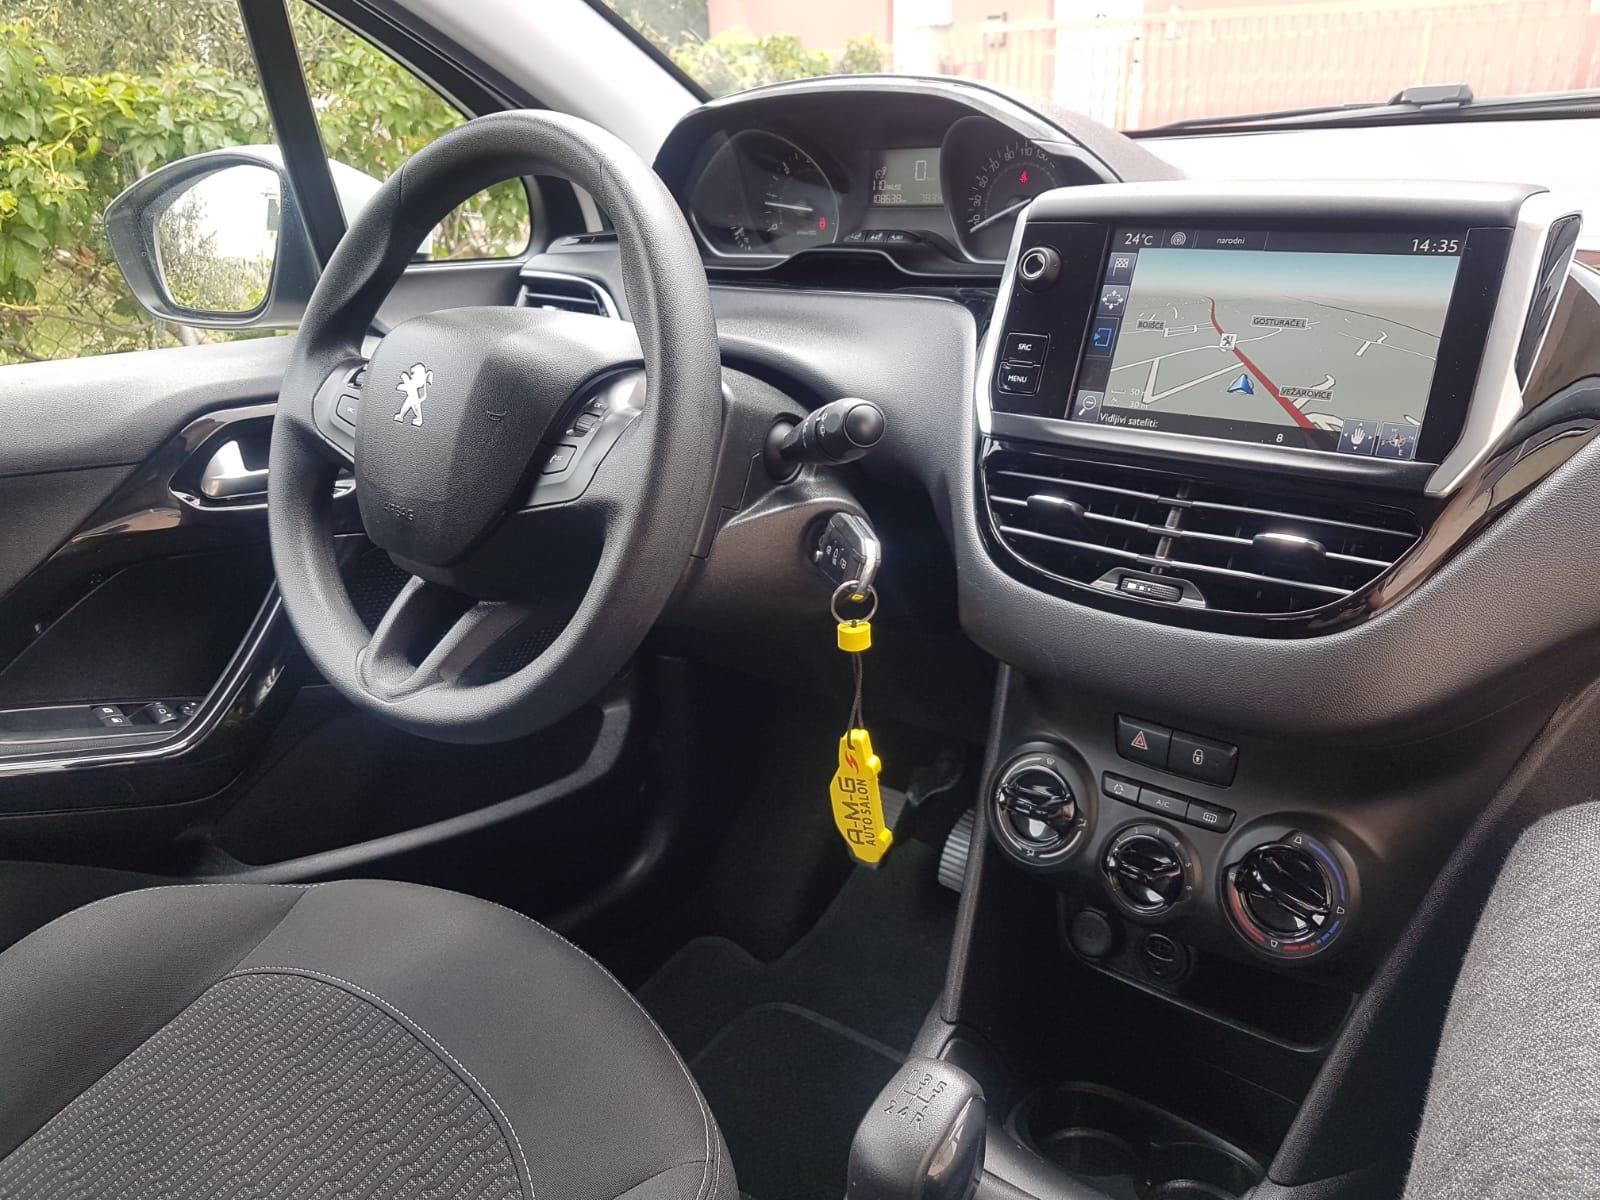 Peugeot 208 1.6, BlueHDi, navigacija, Active-Facelift